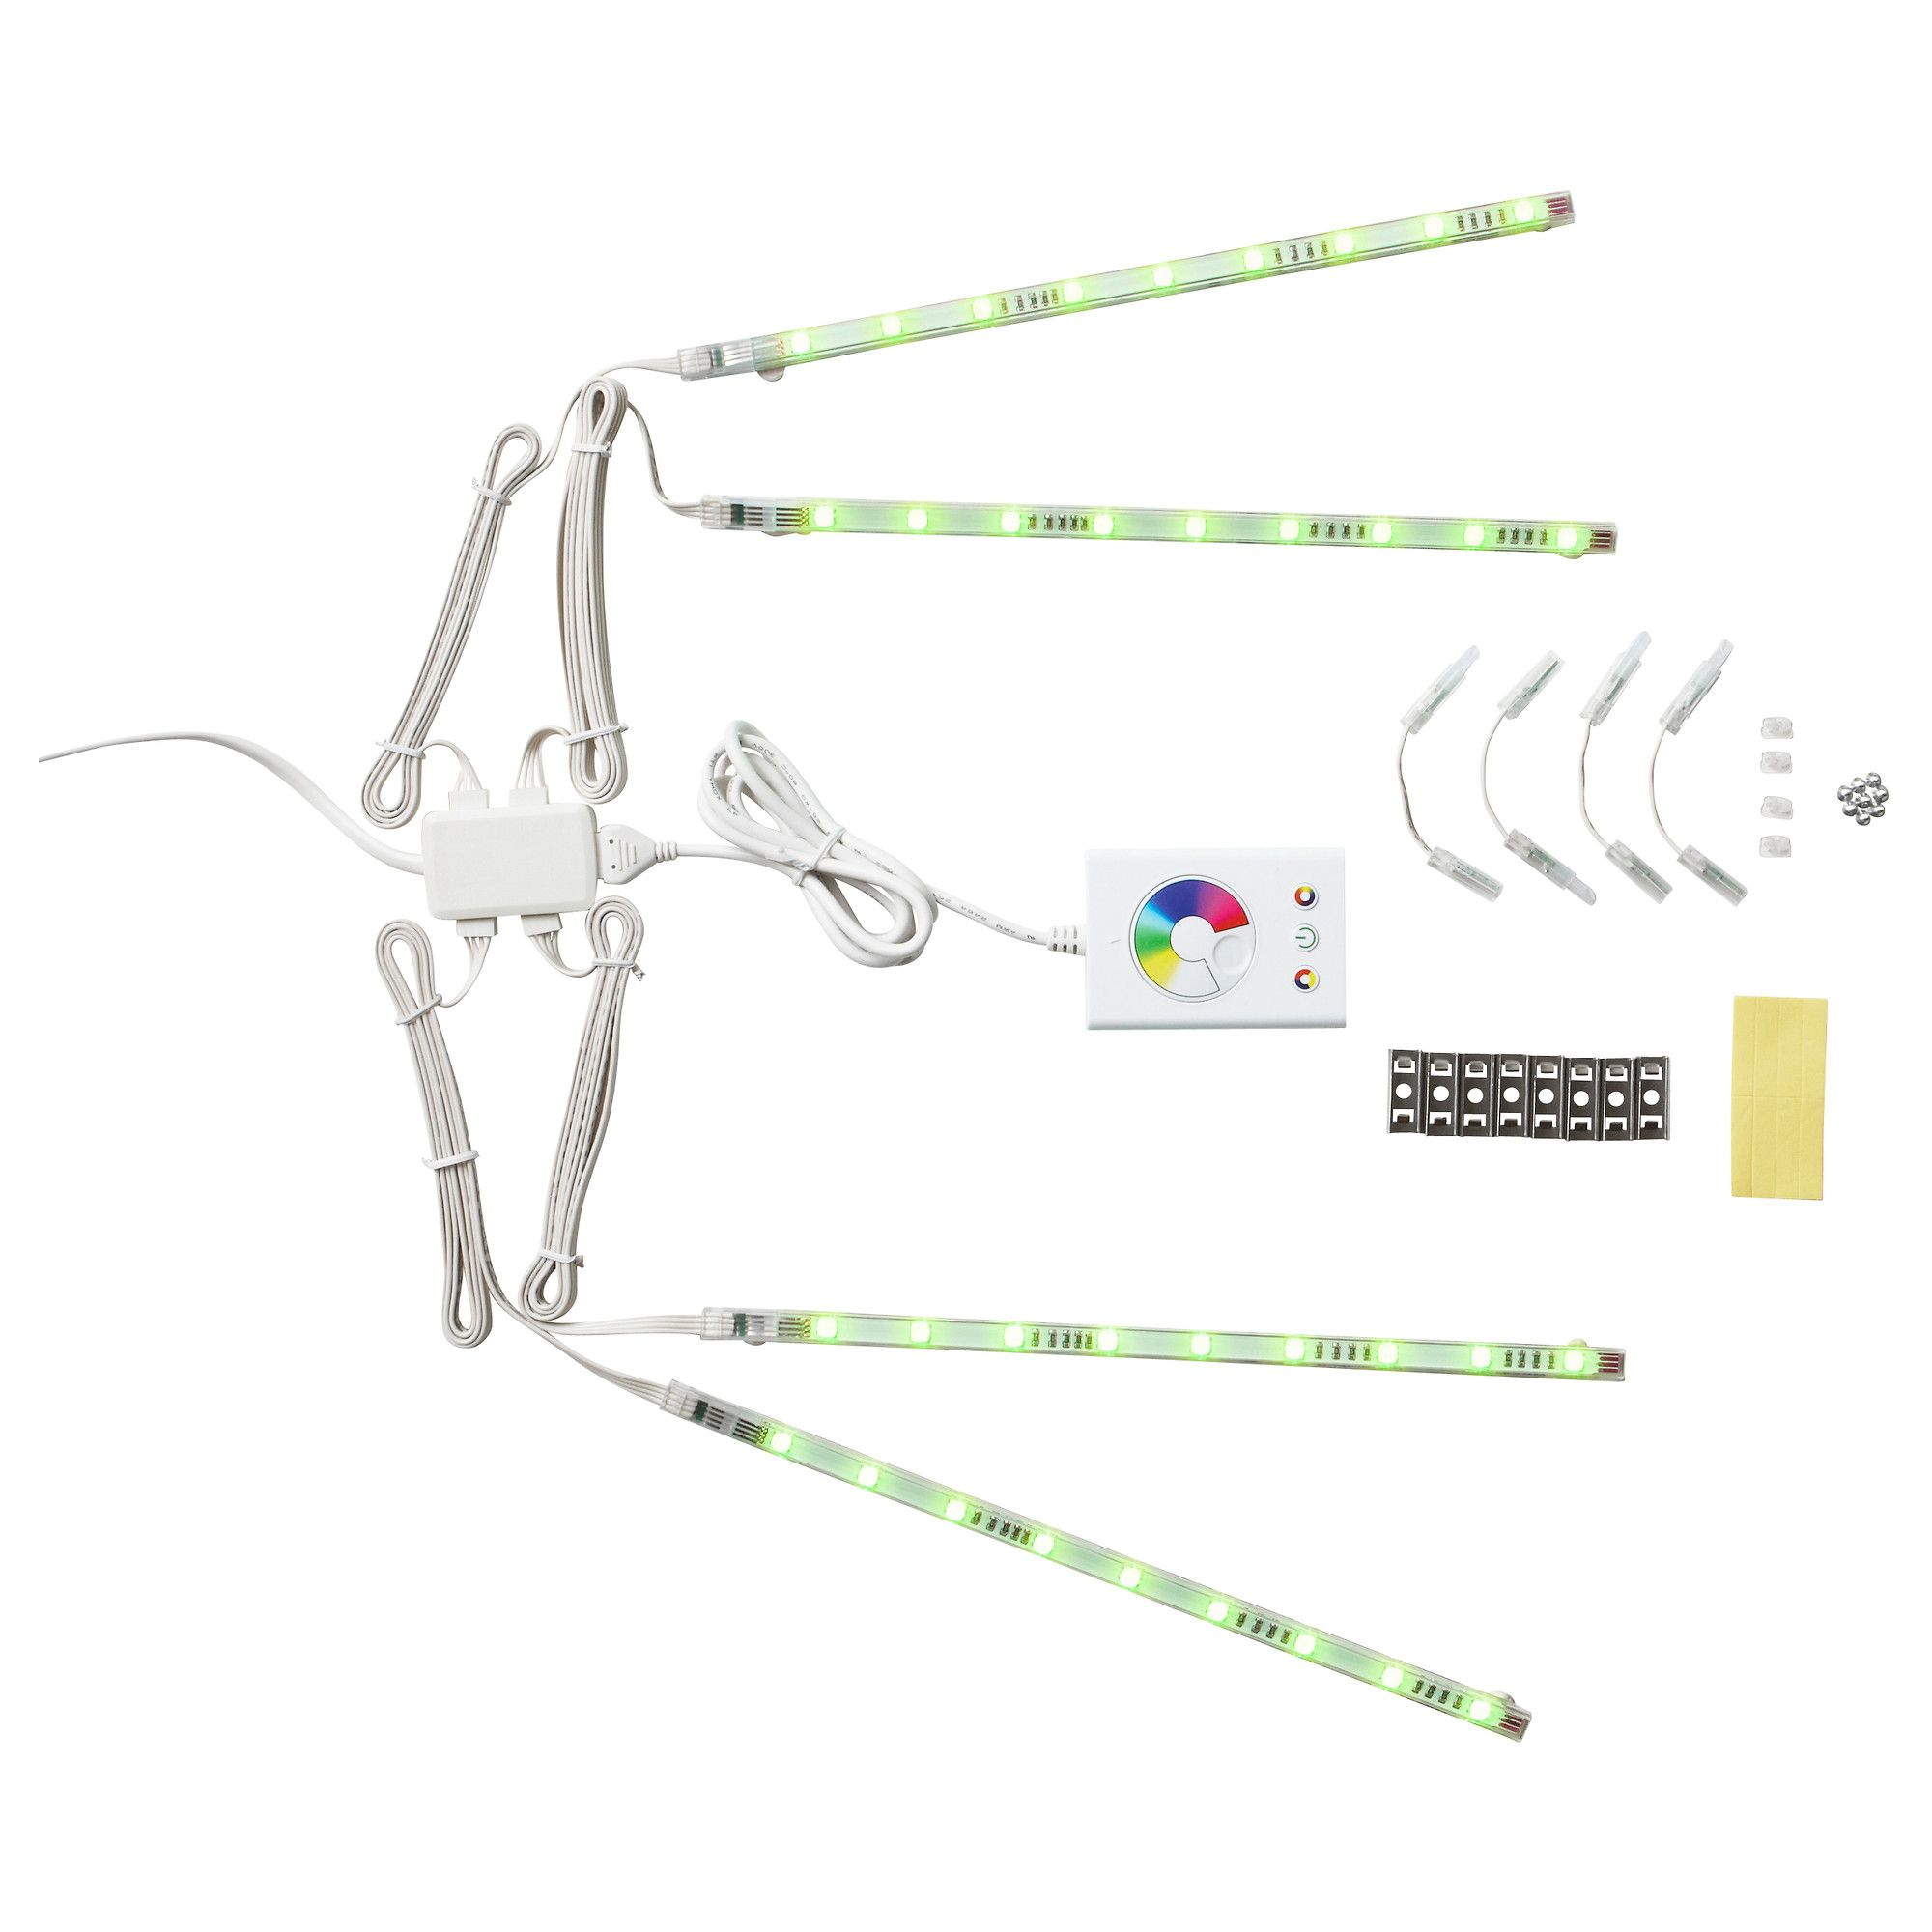 Ikea Dioder Multicolor Led 4 Piece Light Strip Set